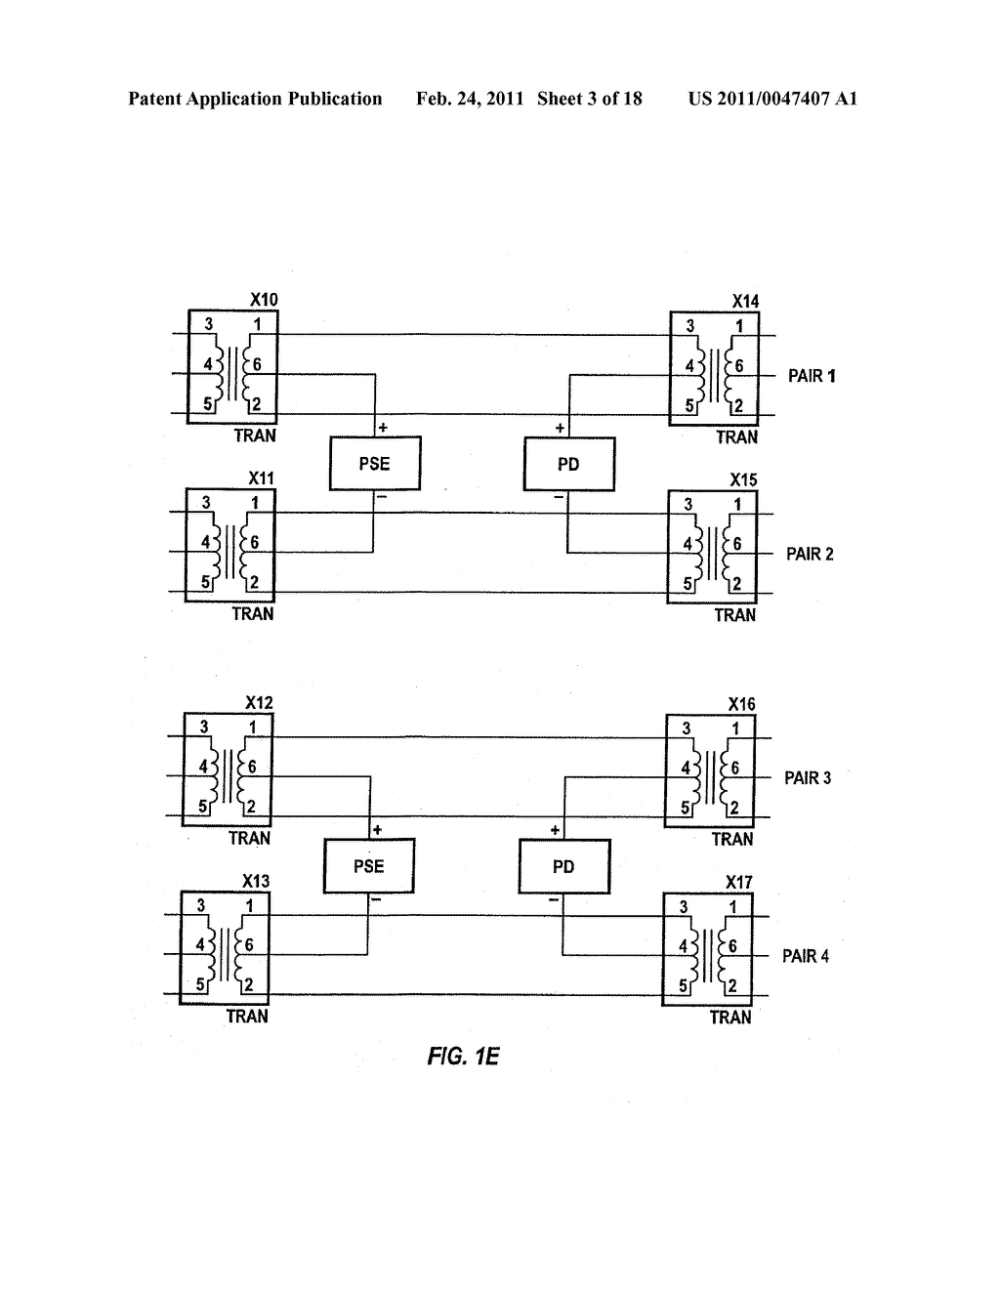 medium resolution of power and data redundancy in a single wiring closet diagram pelvic girdle diagram power and data